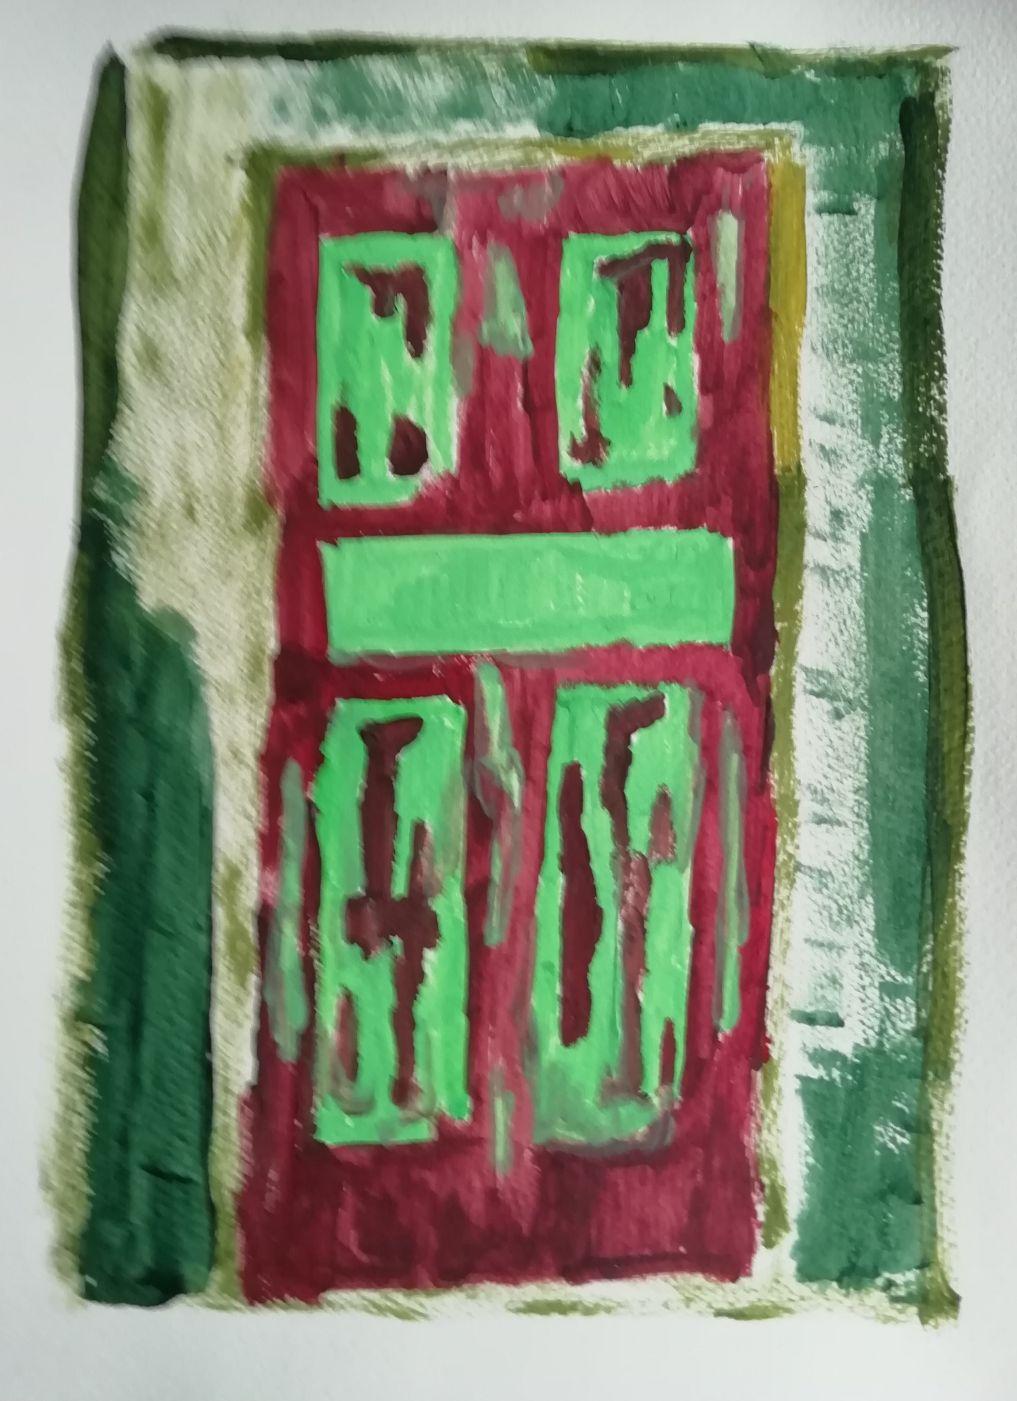 Una puerta (2017) - Yaneth Evangelina Avila Pinto